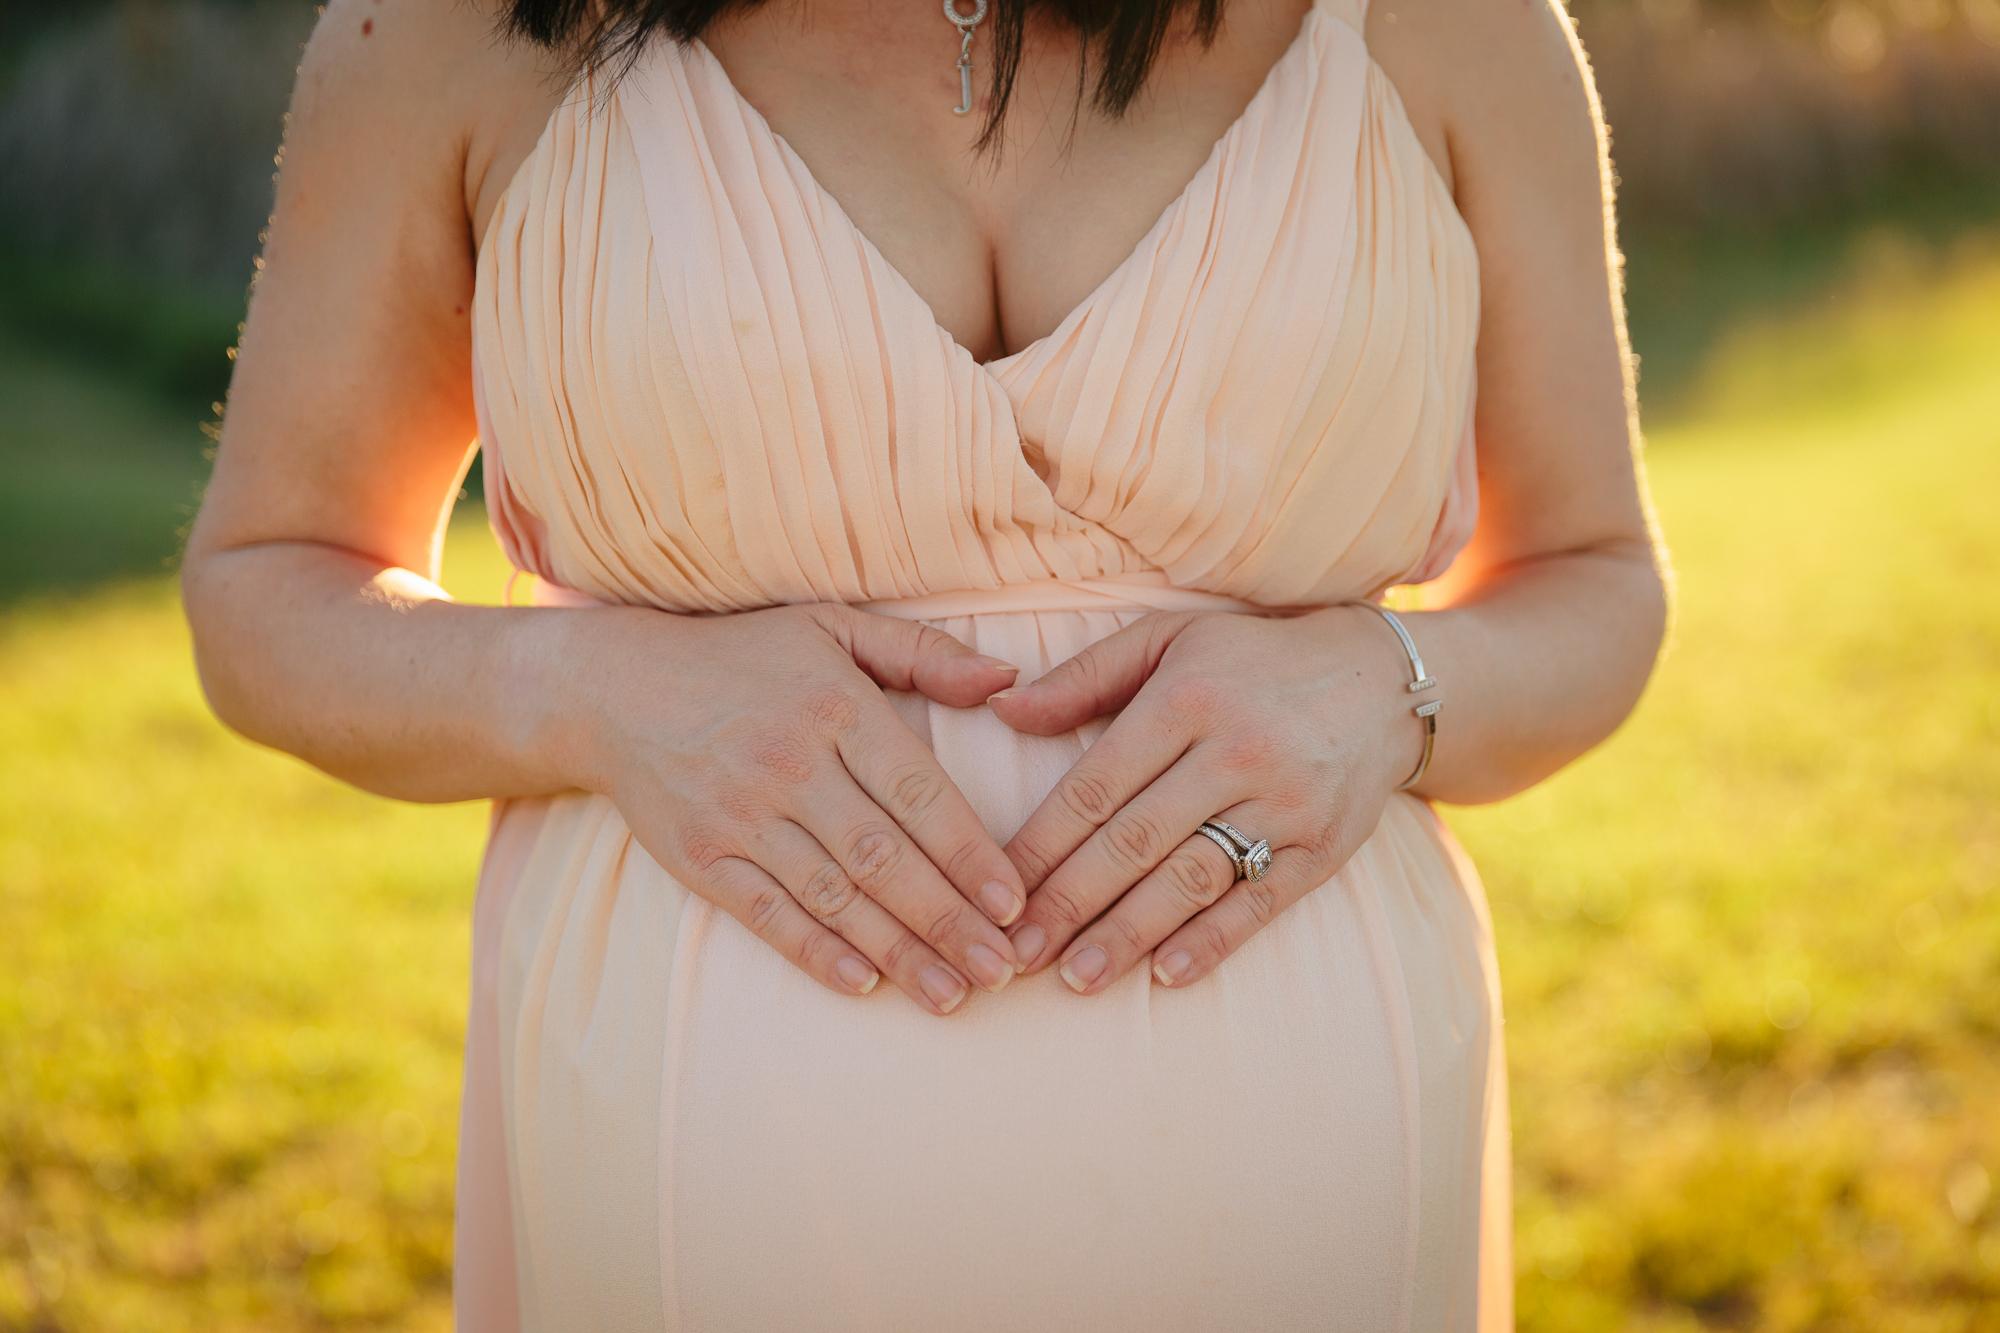 029_Maternity Lifetsyle_Shelley_Sunlight Photography.JPG